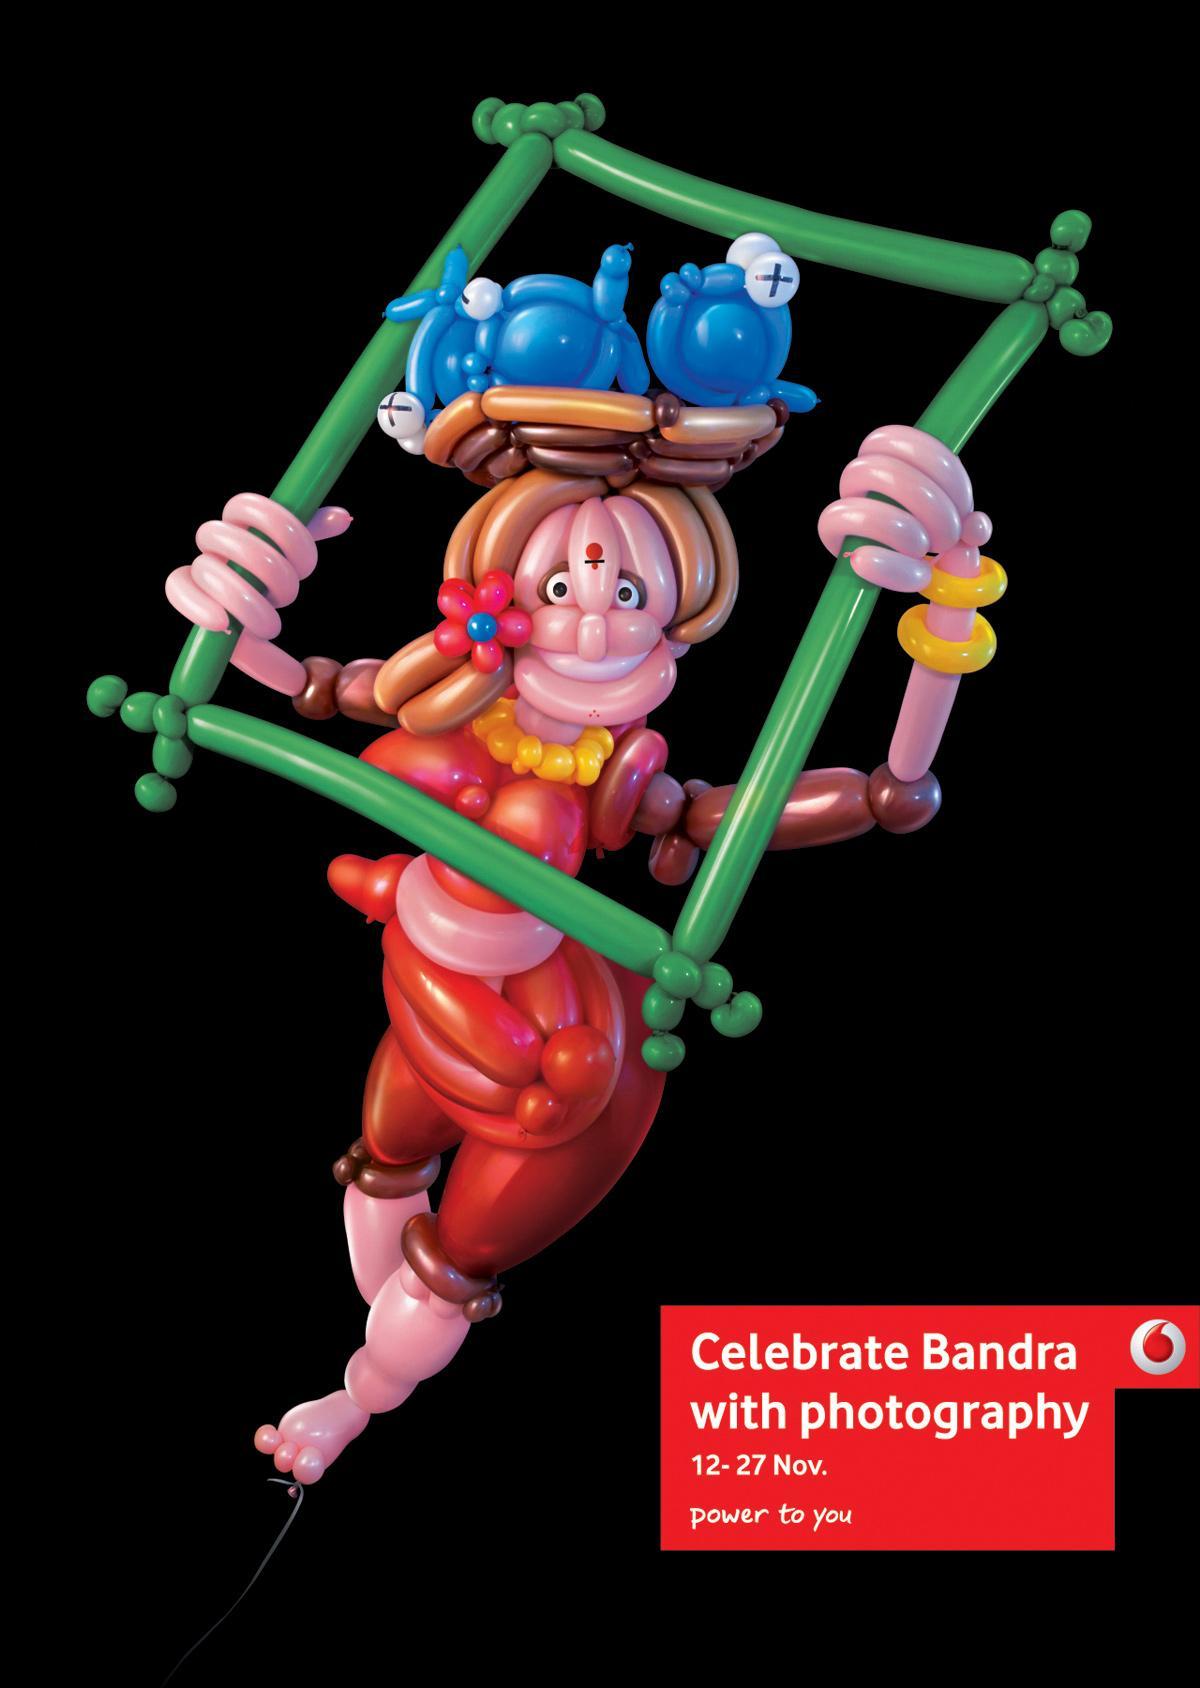 Vodafone Print Ad -  Celebrate Bandra, Photo frame